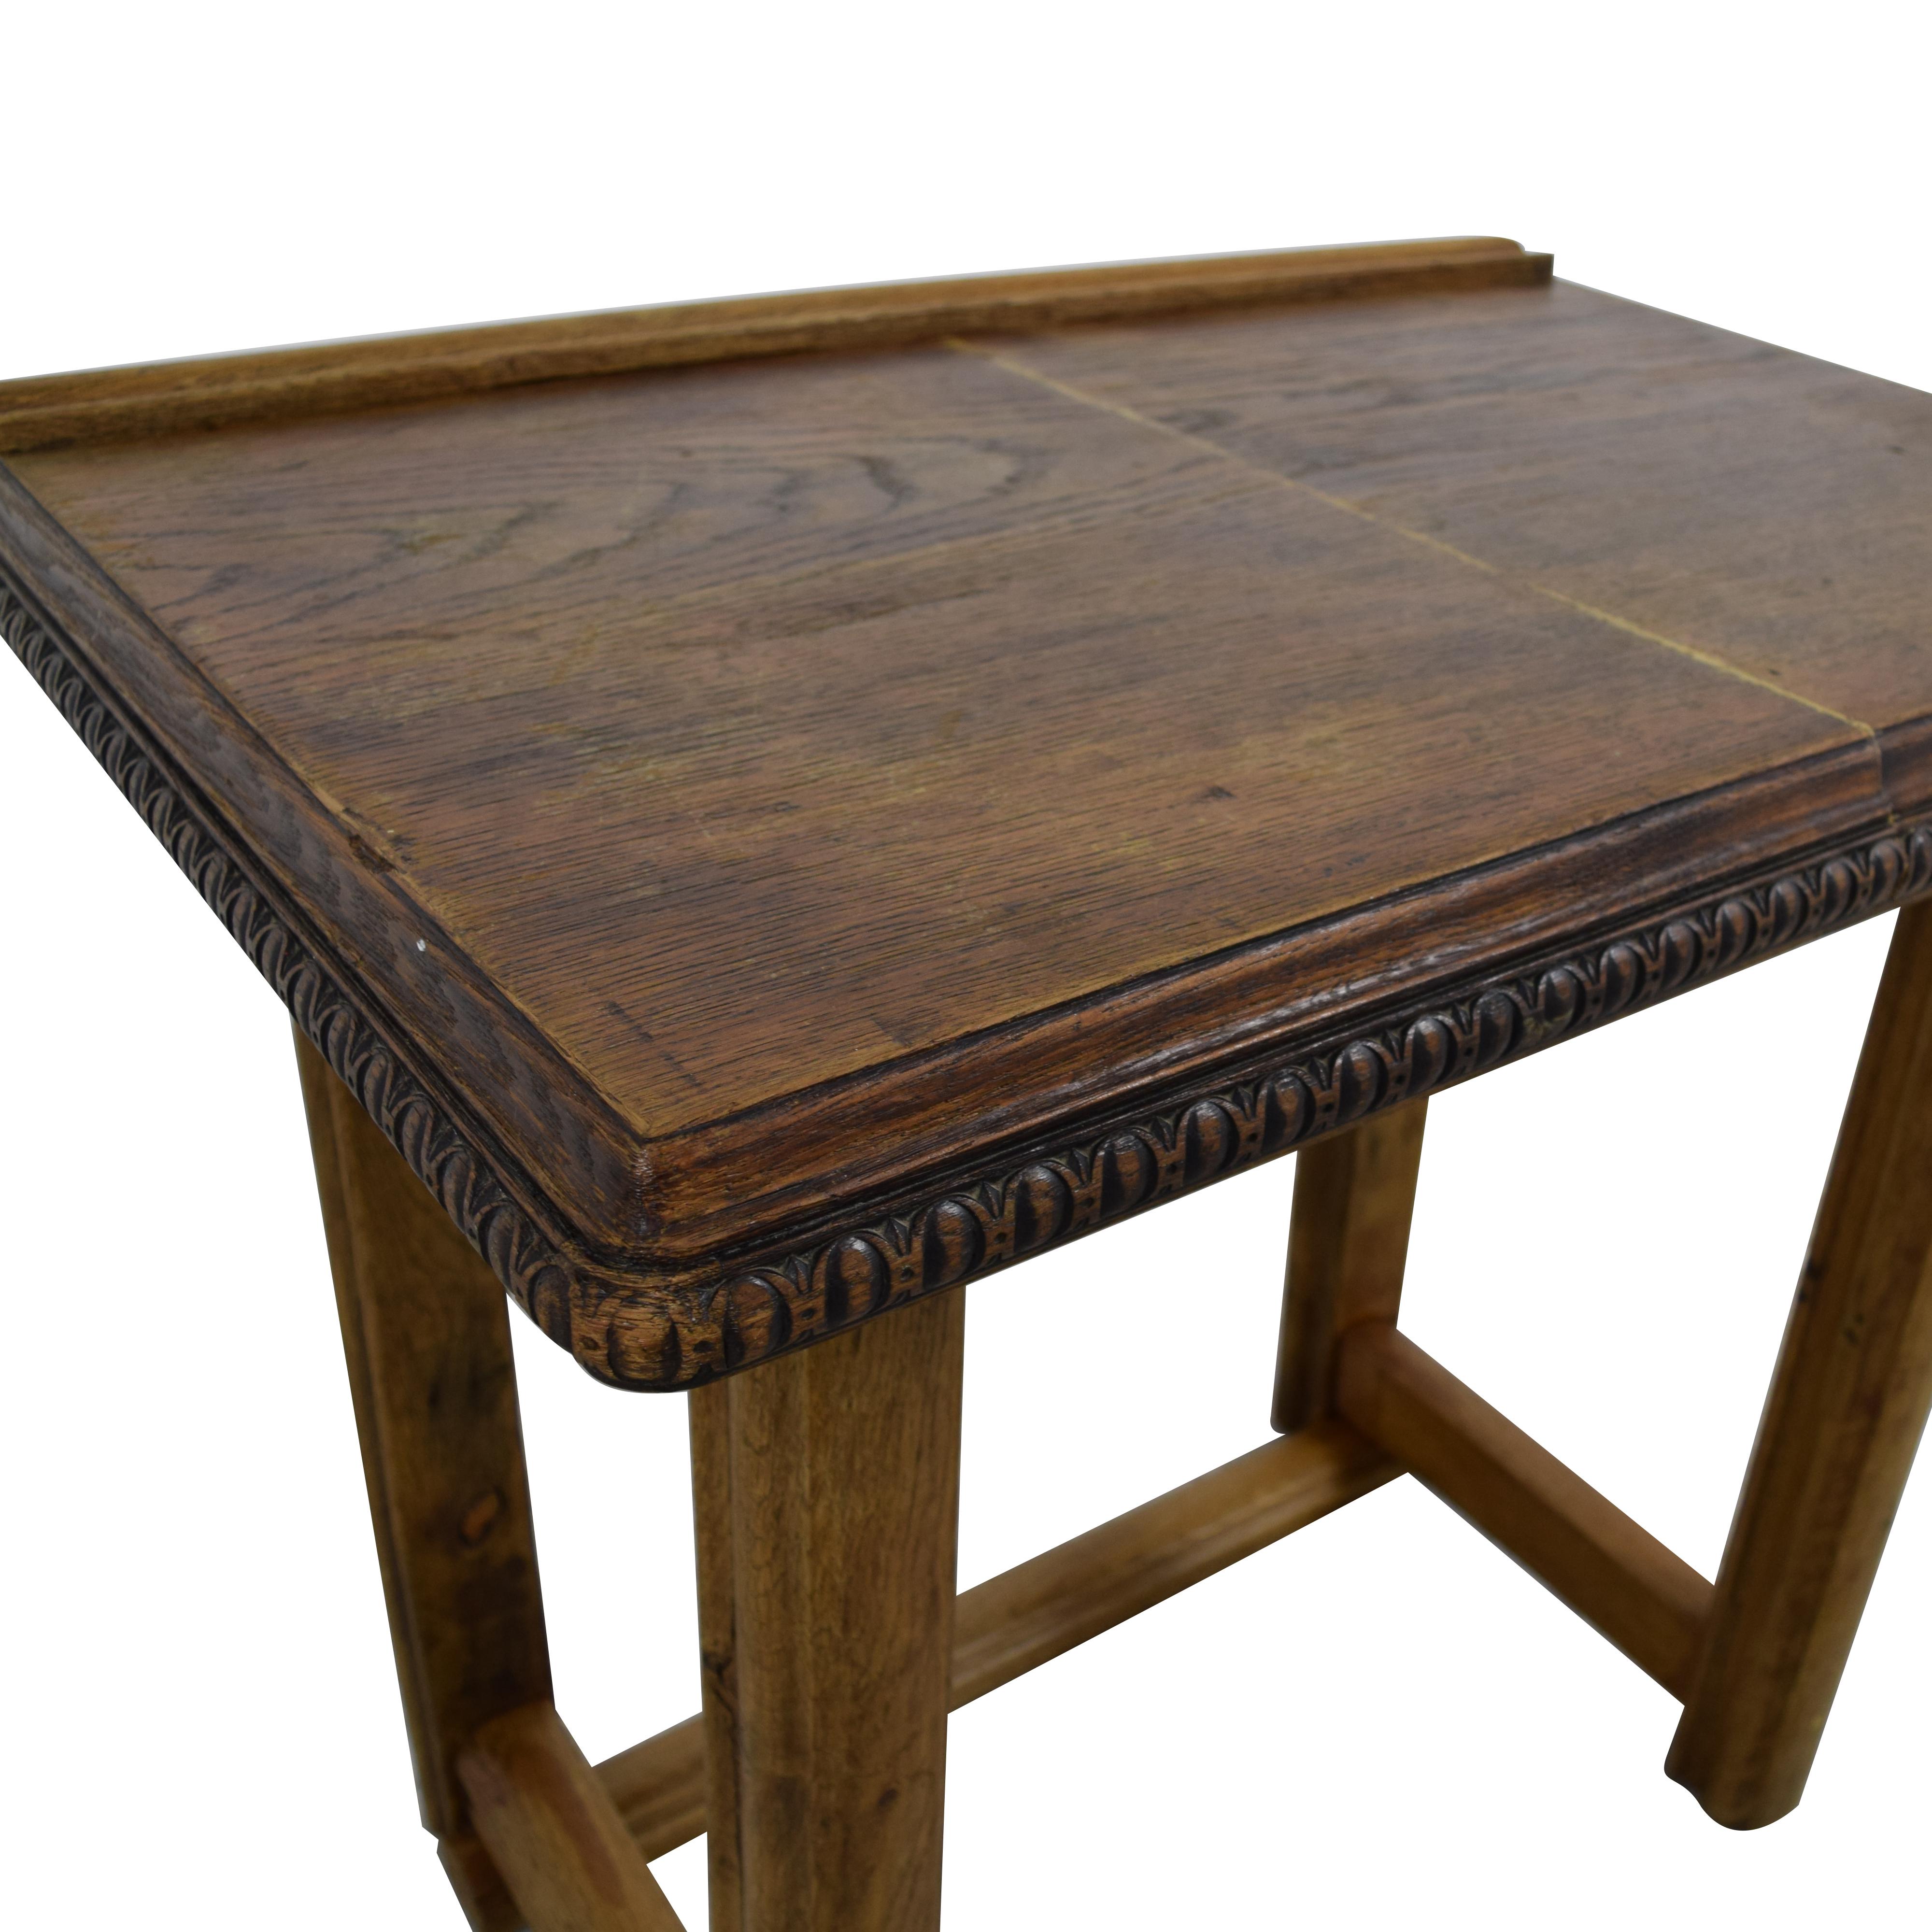 90 off antique student desk tables rh furnishare com antique student desk with ink well antique student desk collectors